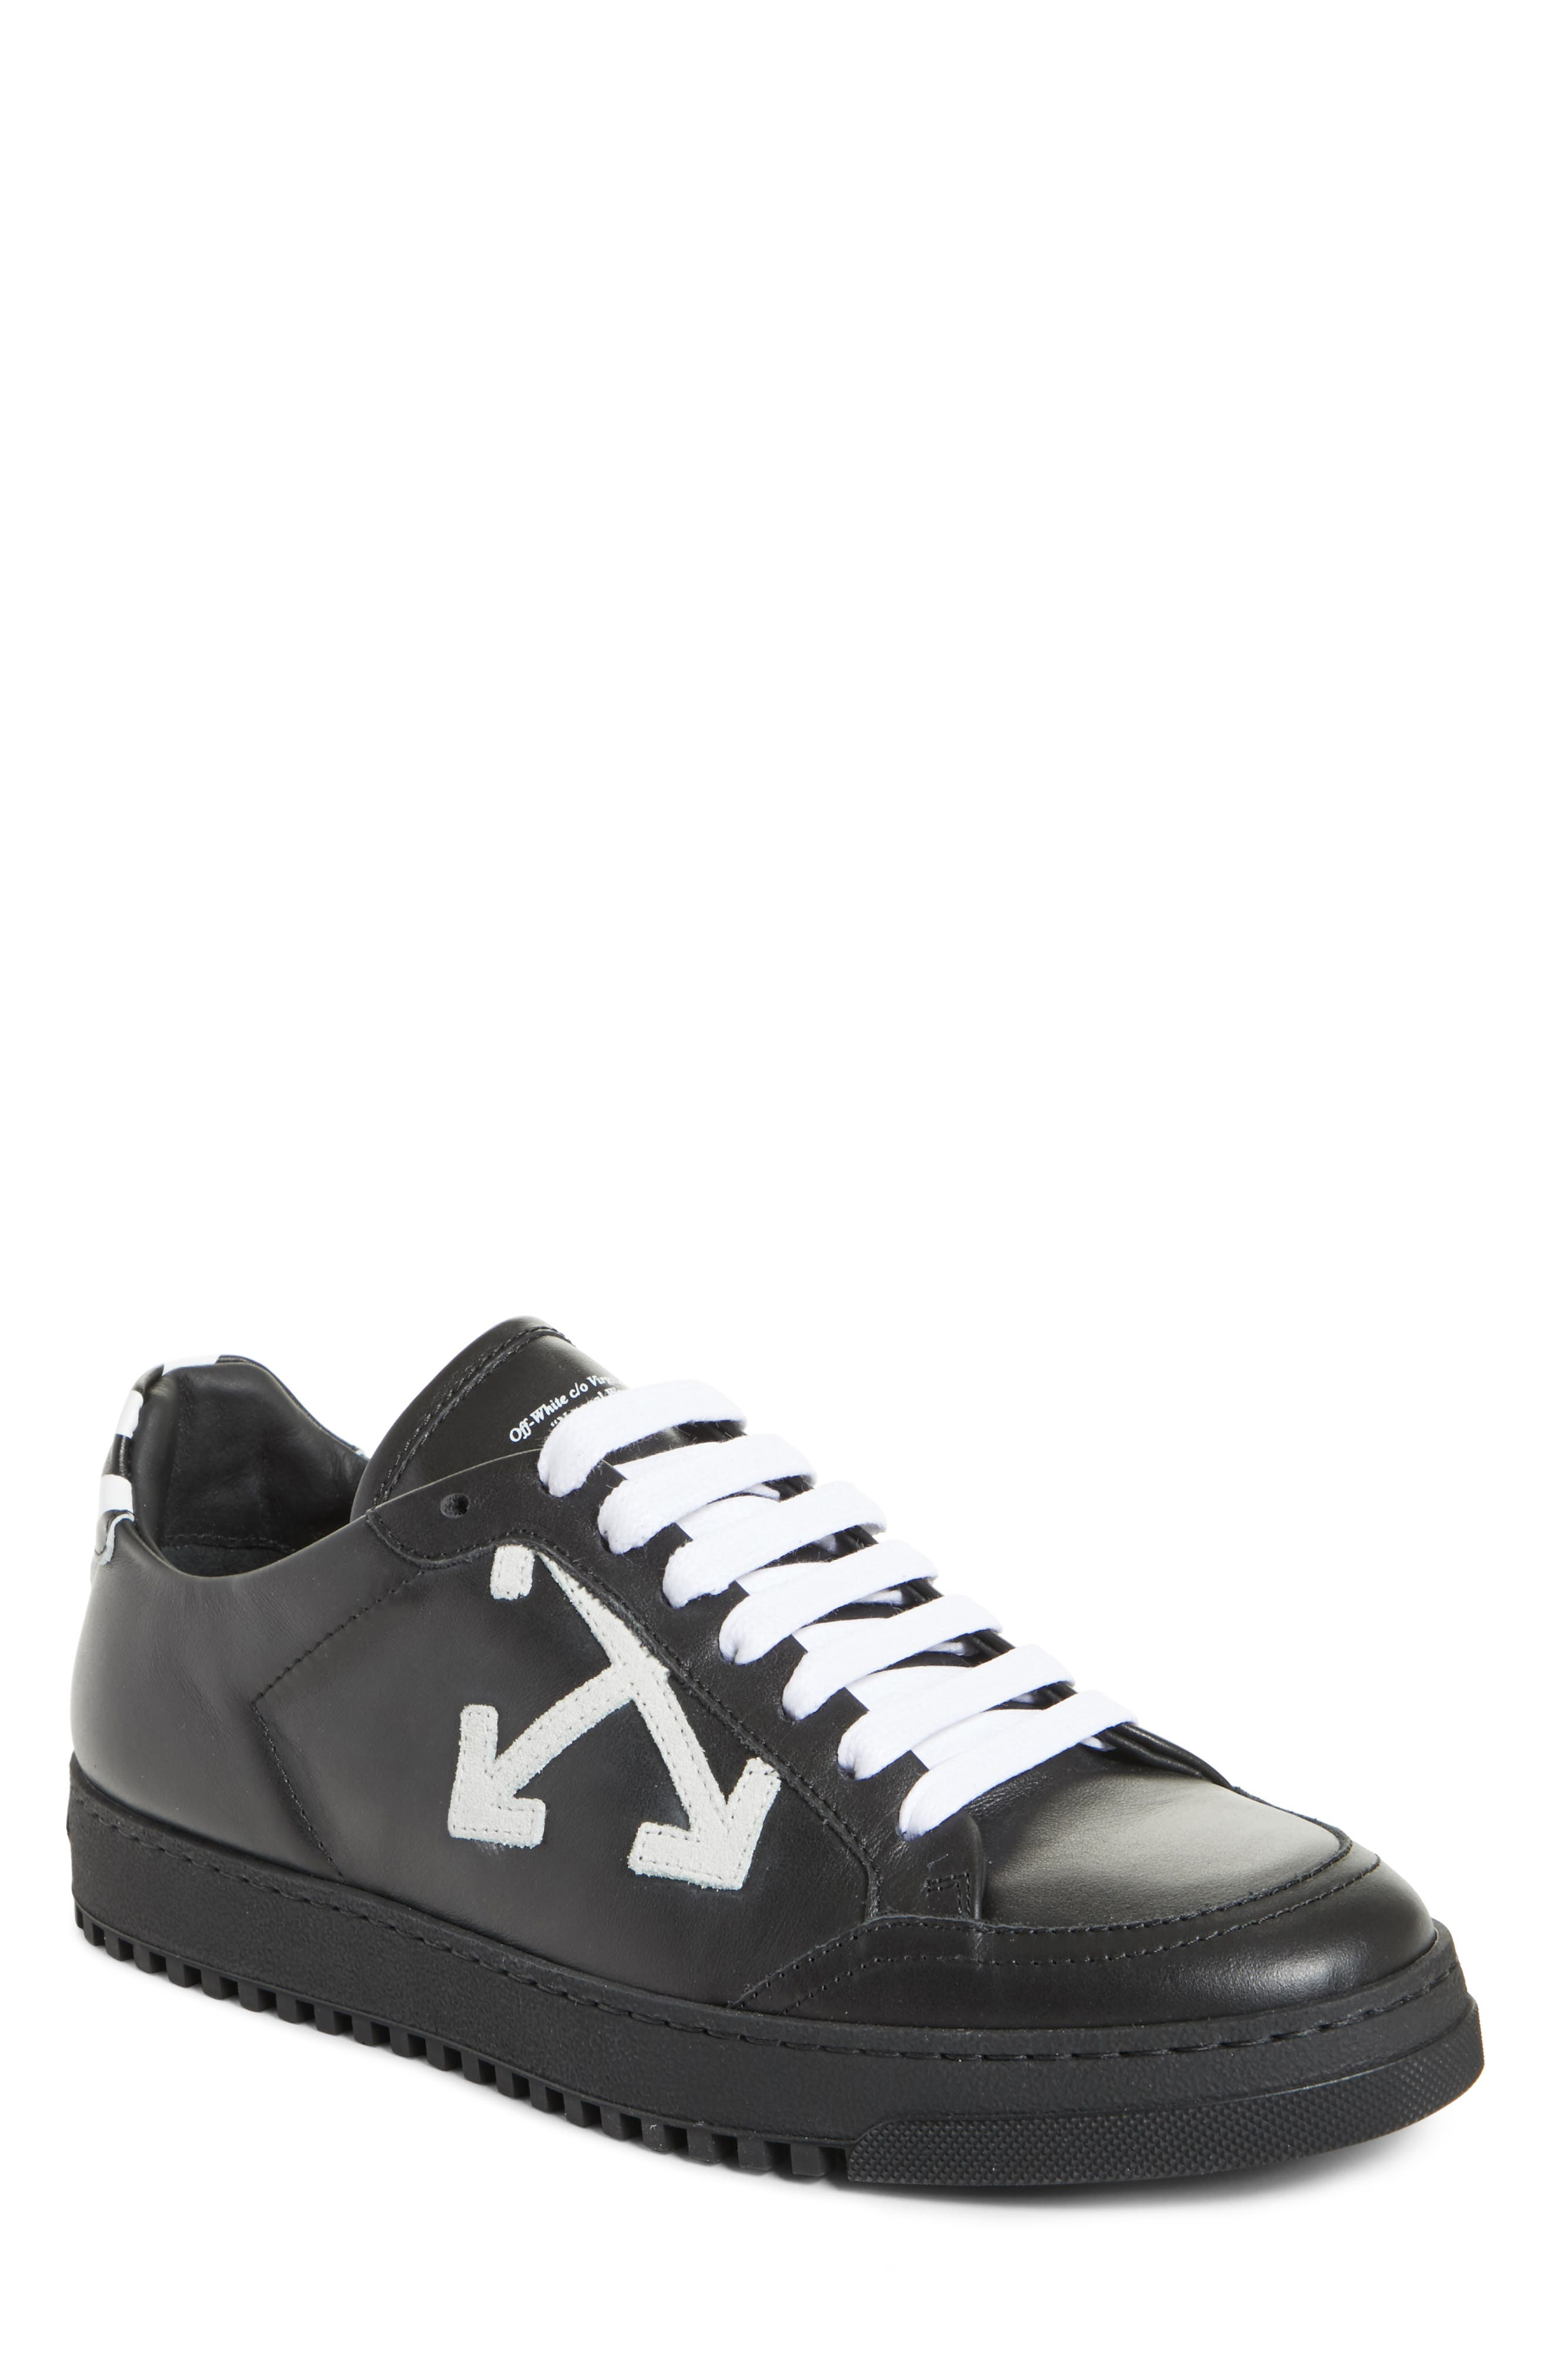 Off-White Arrow Sneaker | Nordstrom